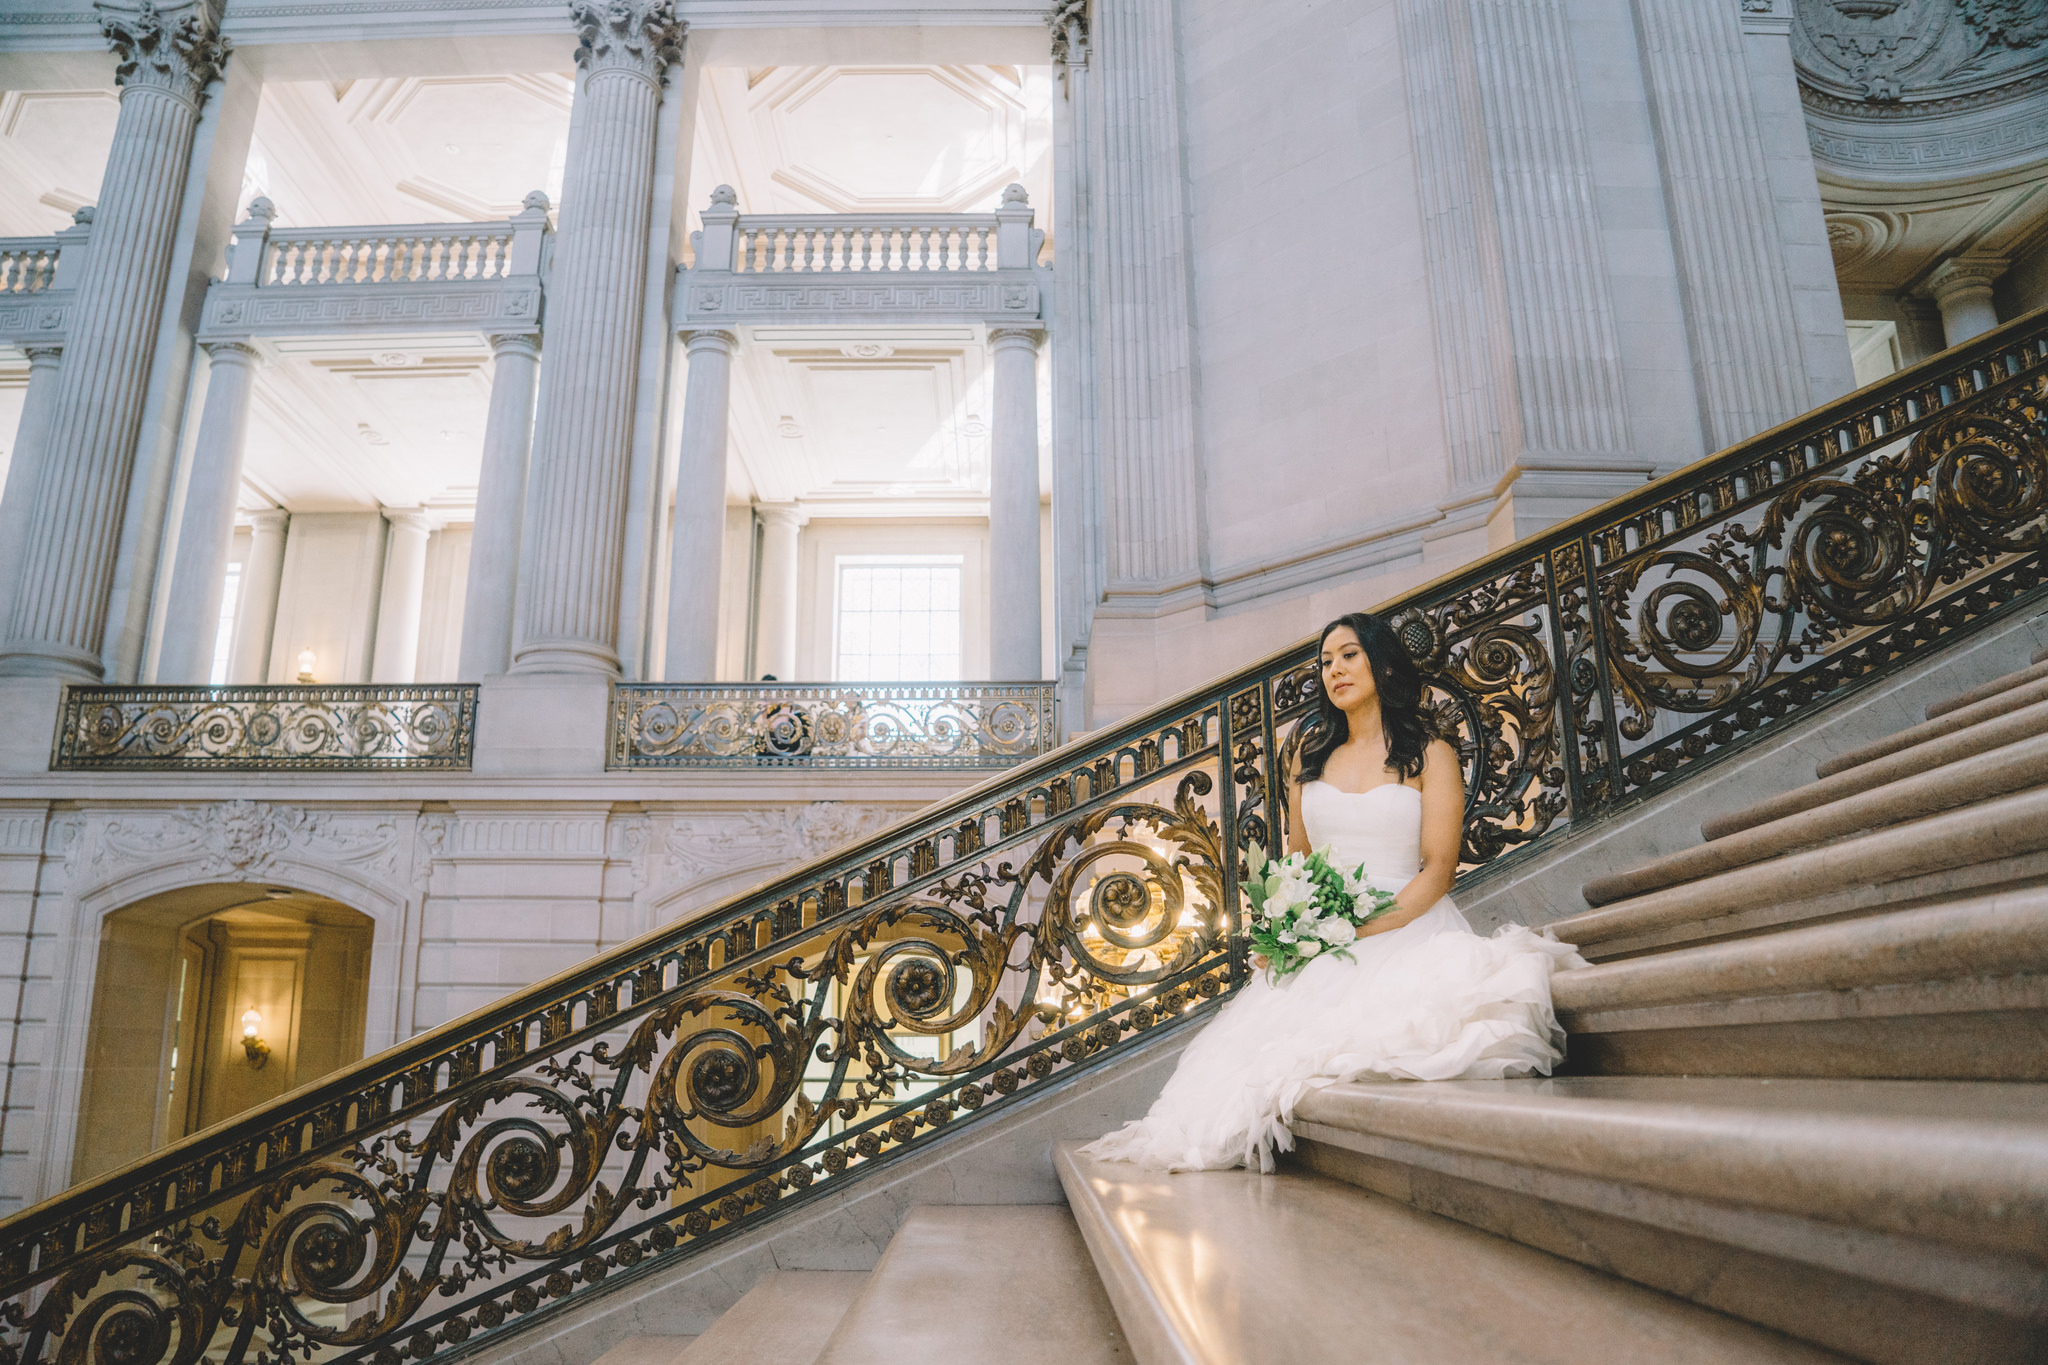 city-hall-stairs2.jpg